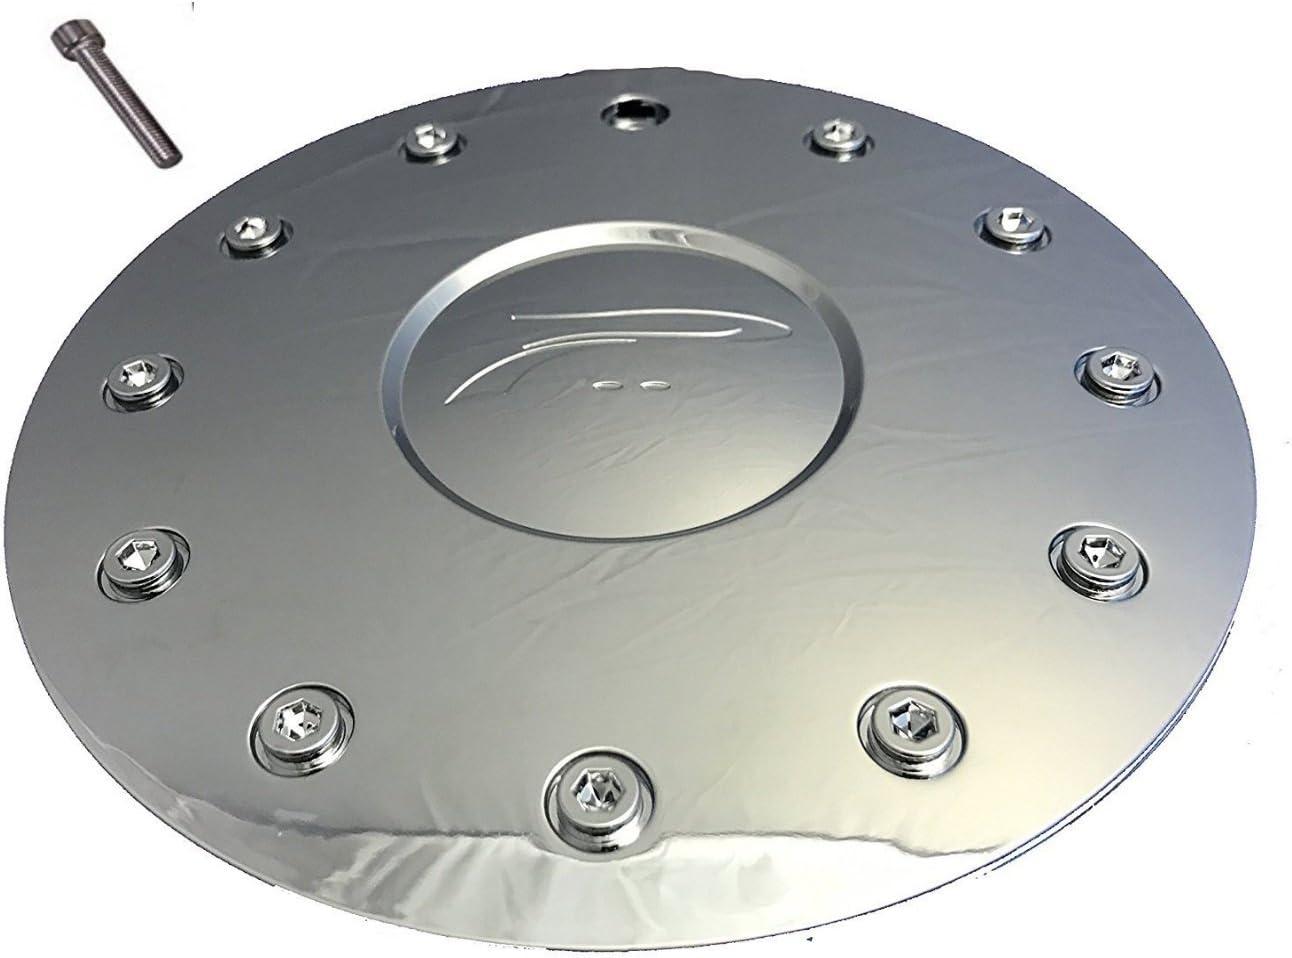 NEW PLATINUM SHIELD BY ULTRA CHROME WHEEL RIM CENTER CAP 89-9215 61002285F-1